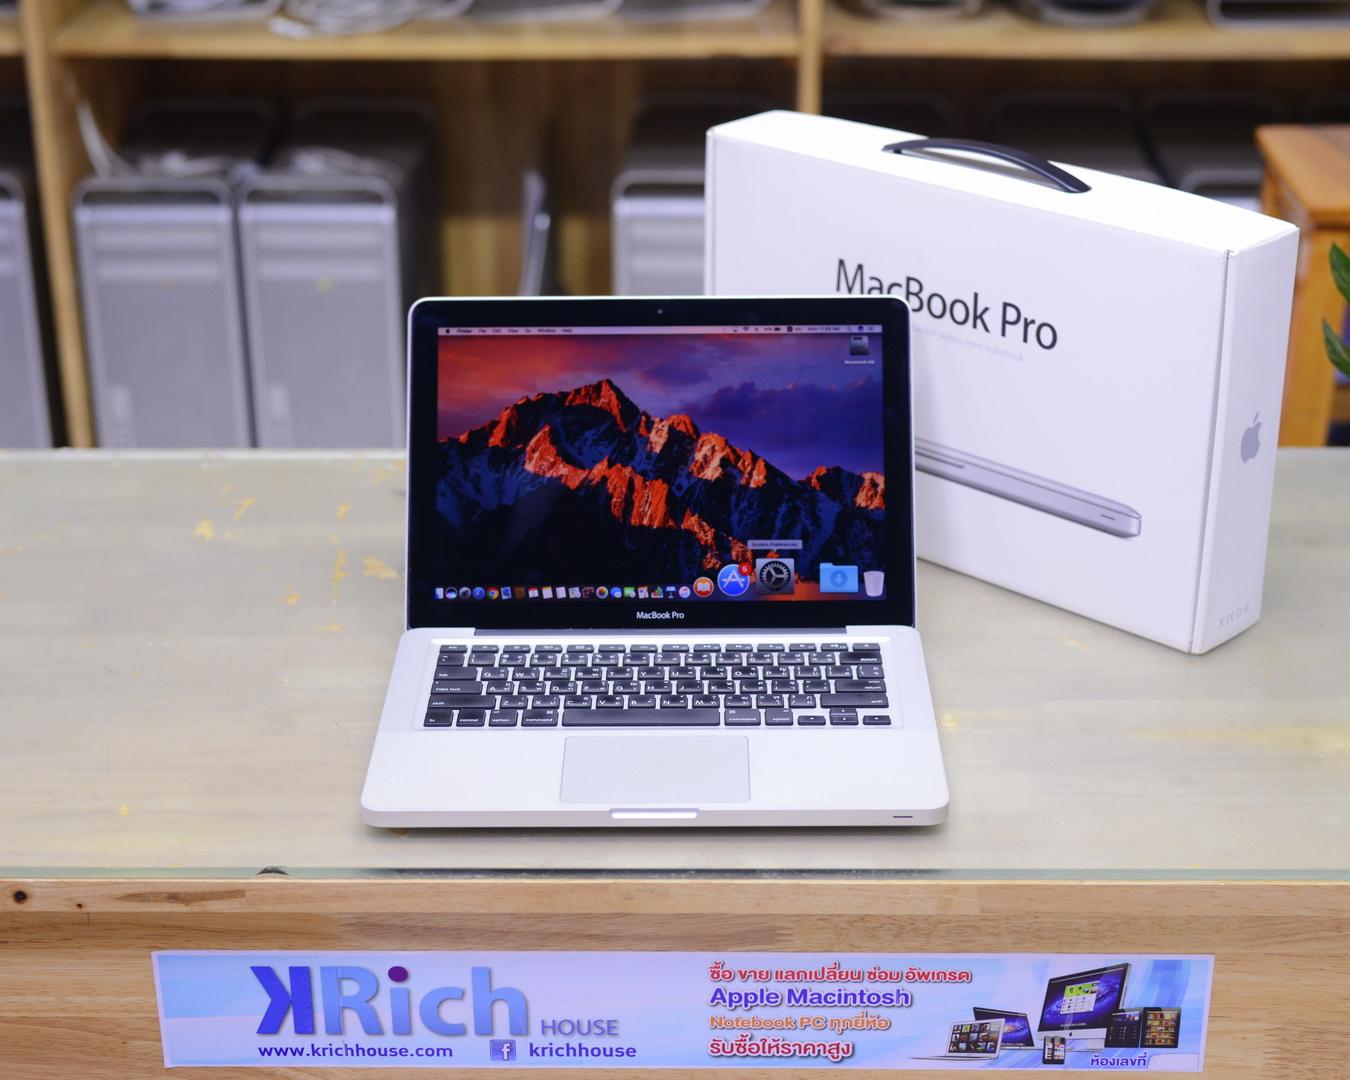 MacBook Pro (13-inch, Mid 2012) - Core i5 2.5GHz RAM 4GB HDD 500GB - Fullbox